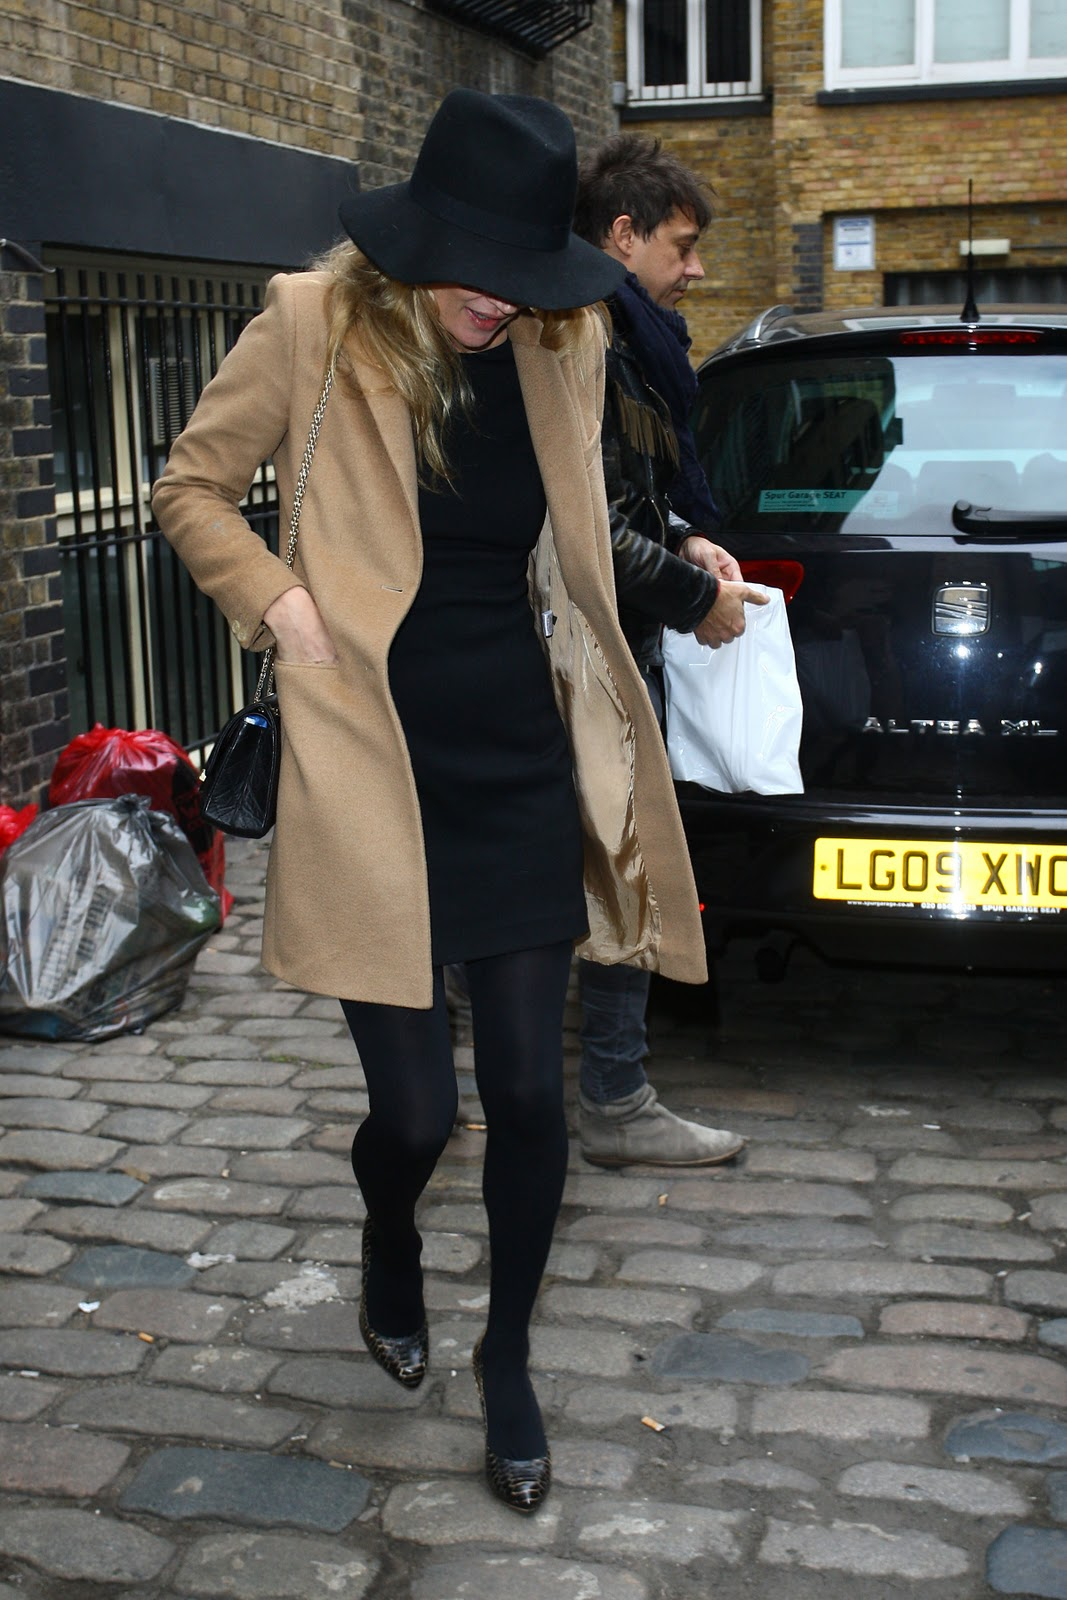 http://2.bp.blogspot.com/_37OJ2FyMWX8/TU1tOBzgi9I/AAAAAAAABoI/eYx61HSw2fk/s1600/09328_Kate_Moss_visiting_a_ewellery_shop_in_London_England_February_2_2011_003_122_65lo.jpg